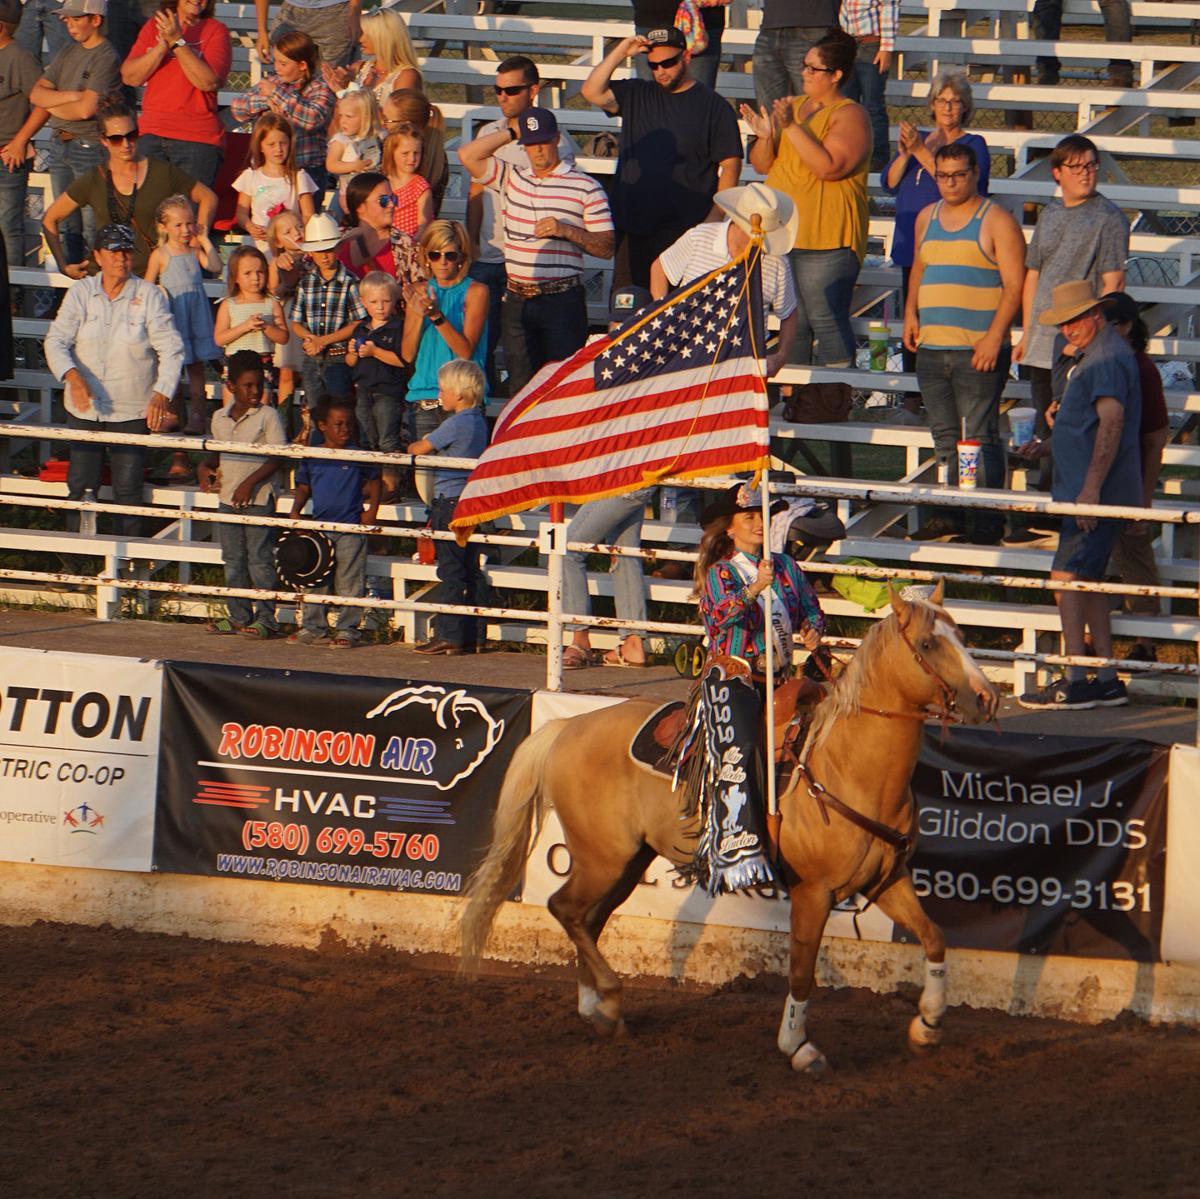 Lawton Rangers Rodeo opening night